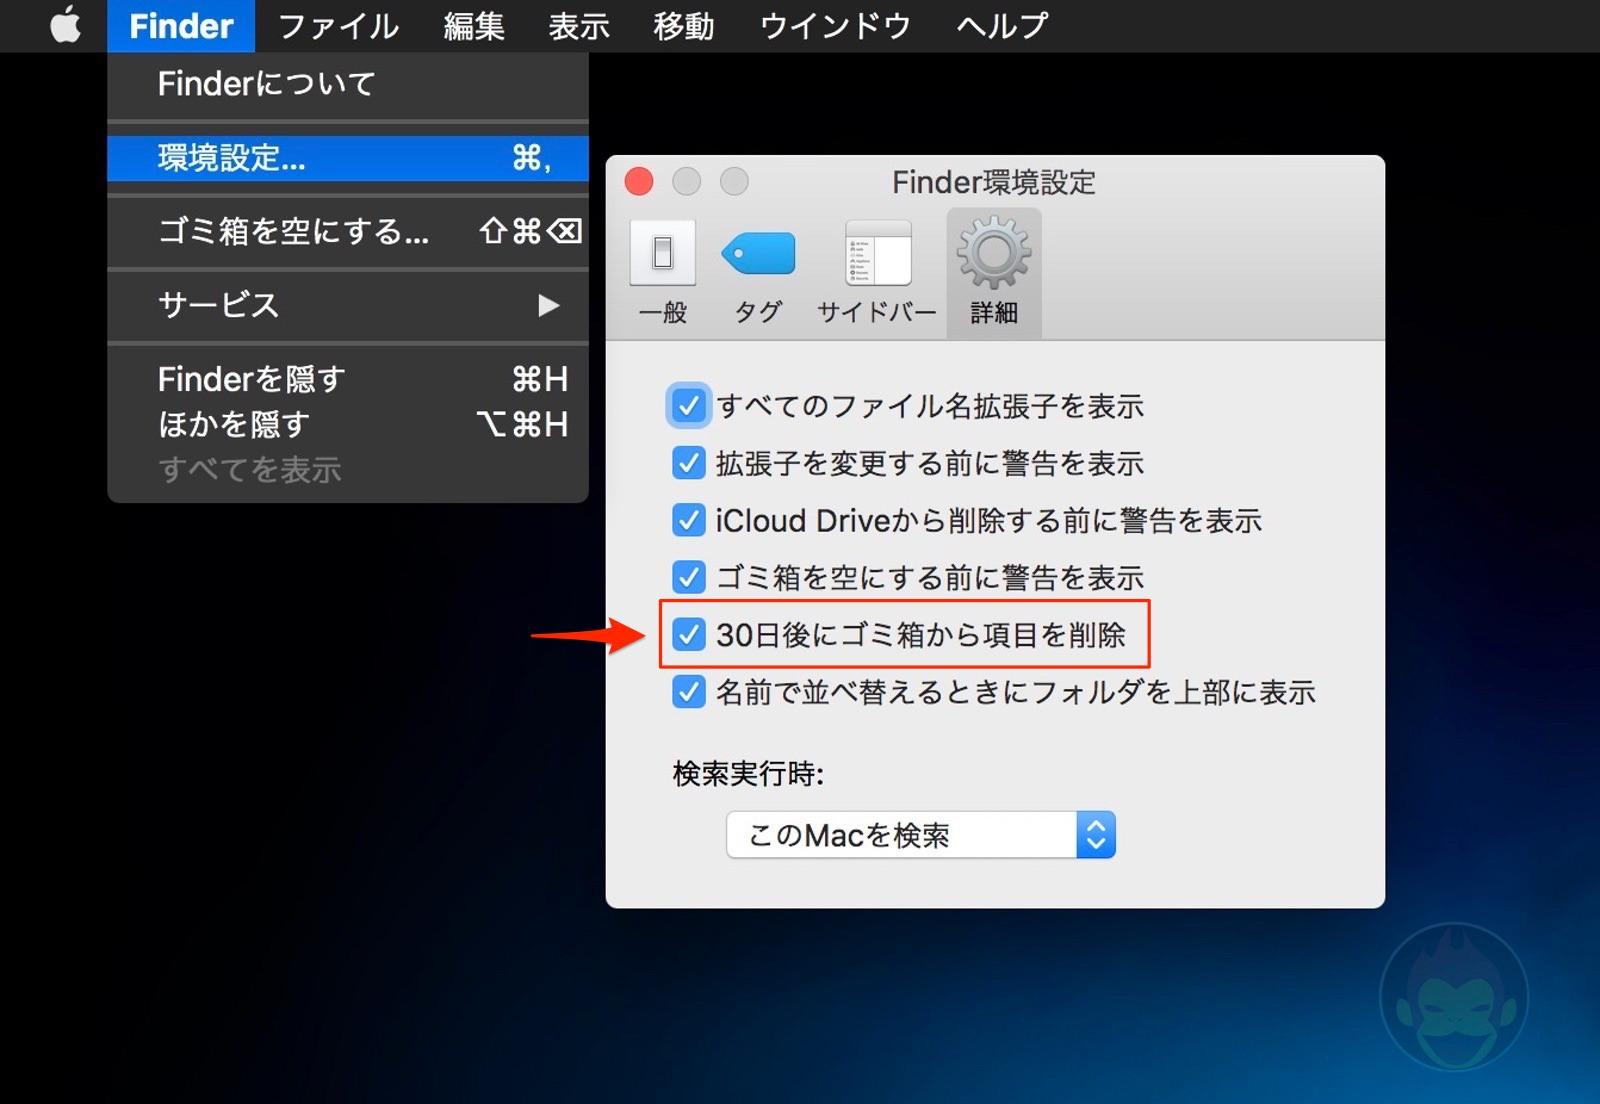 Mac Storage Trash can Finder 01 2